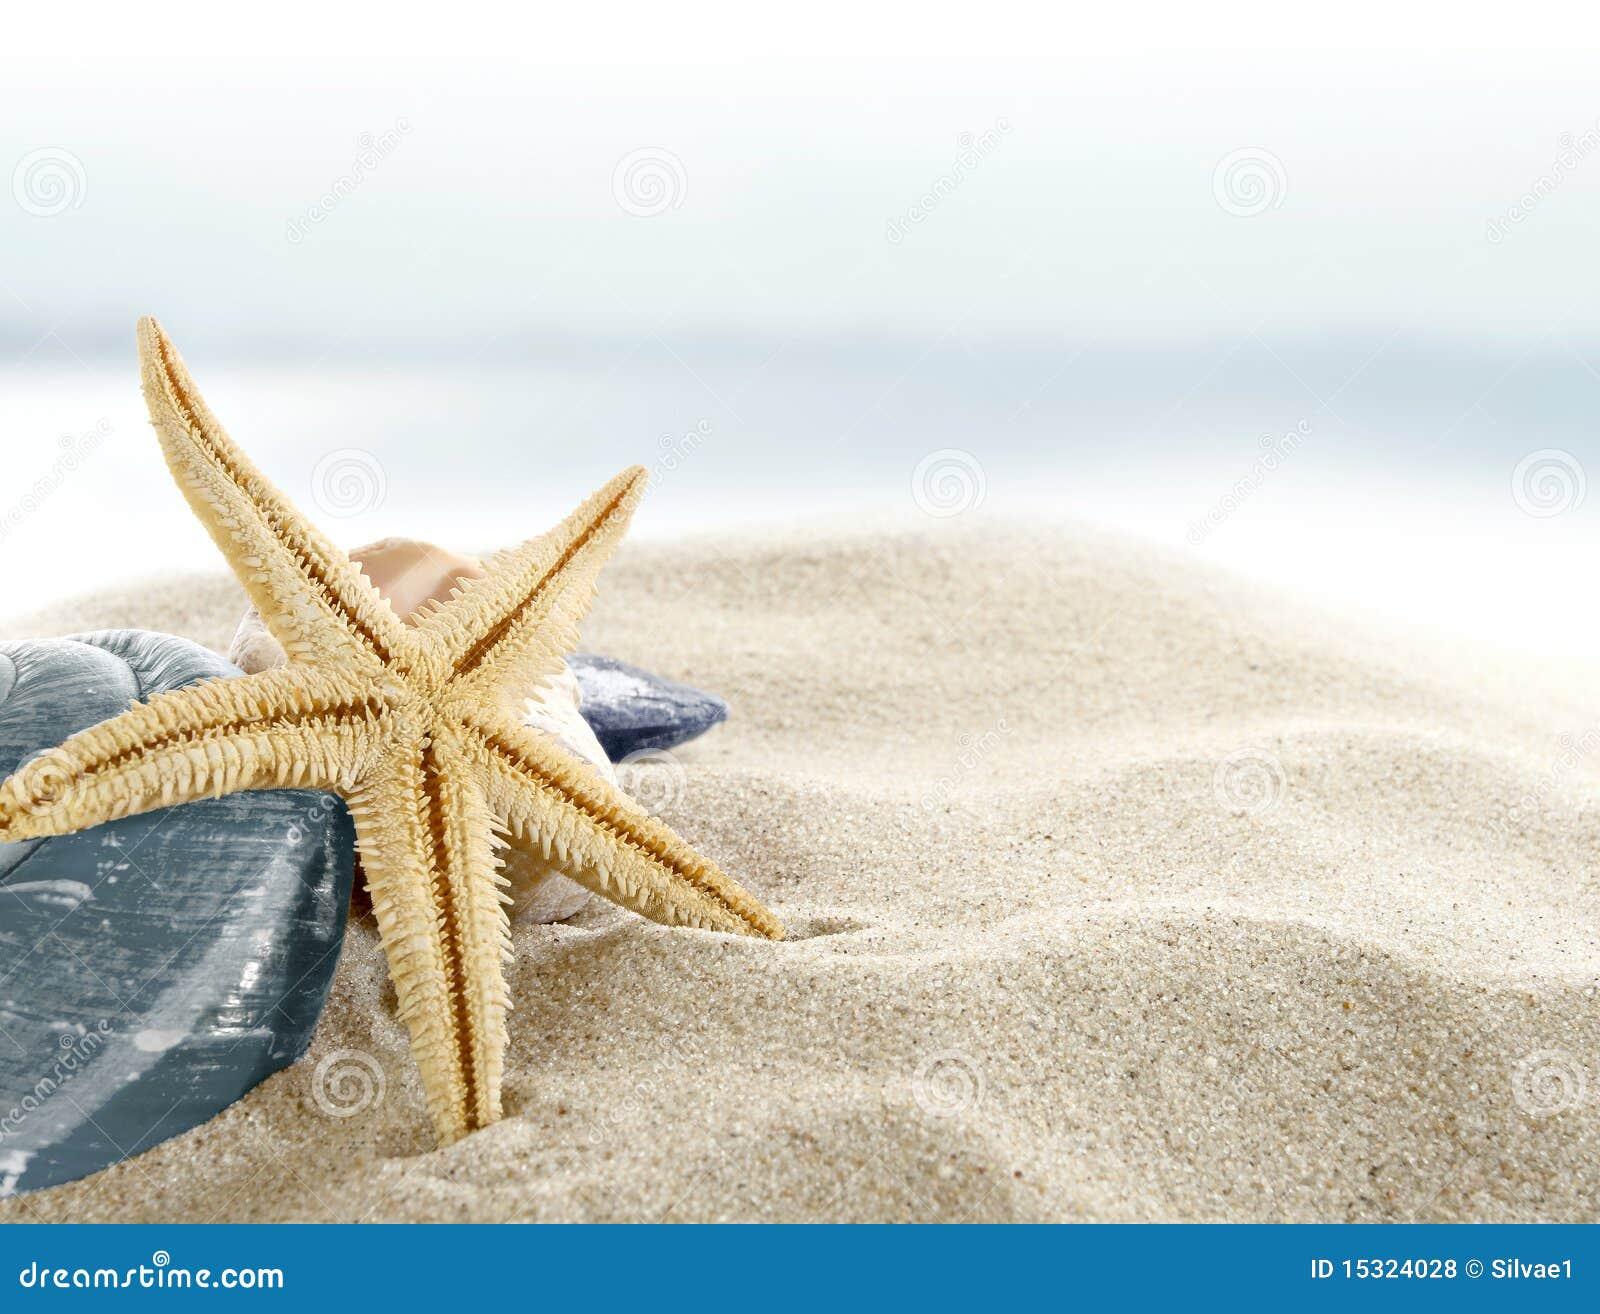 Starfish On The Beach Royalty Free Stock Photos - Image ...